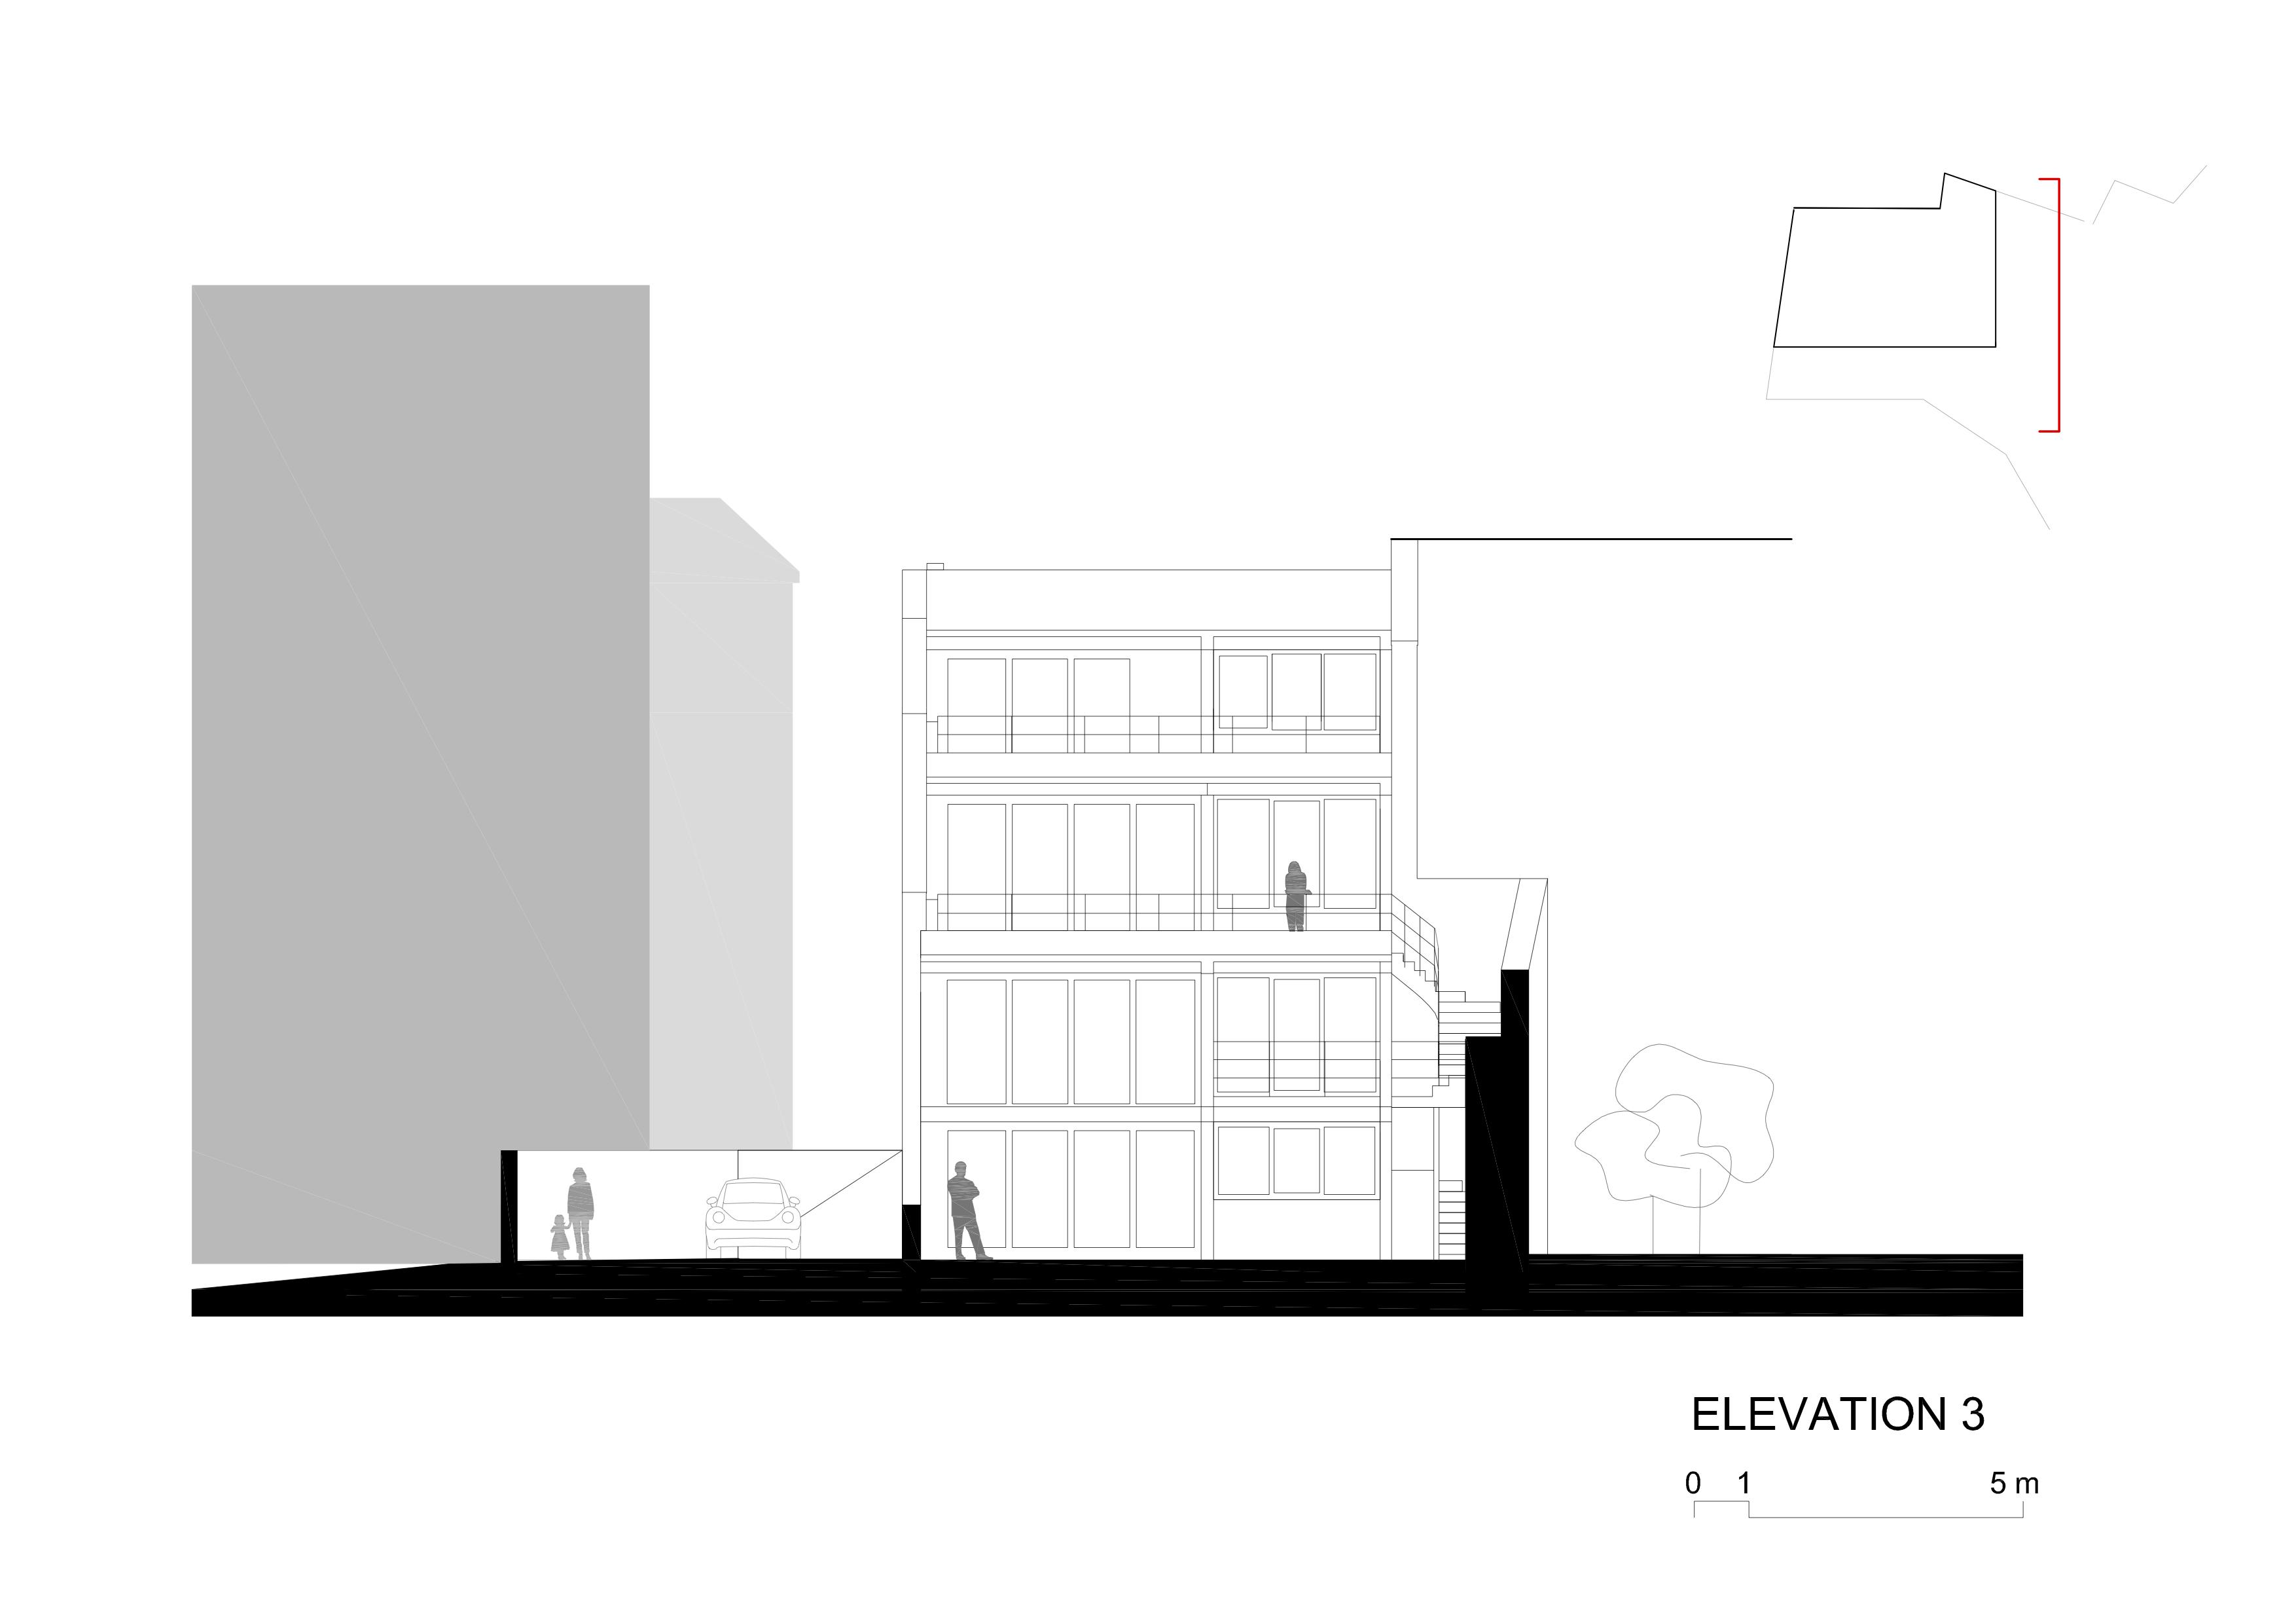 11_ELEVATION 3